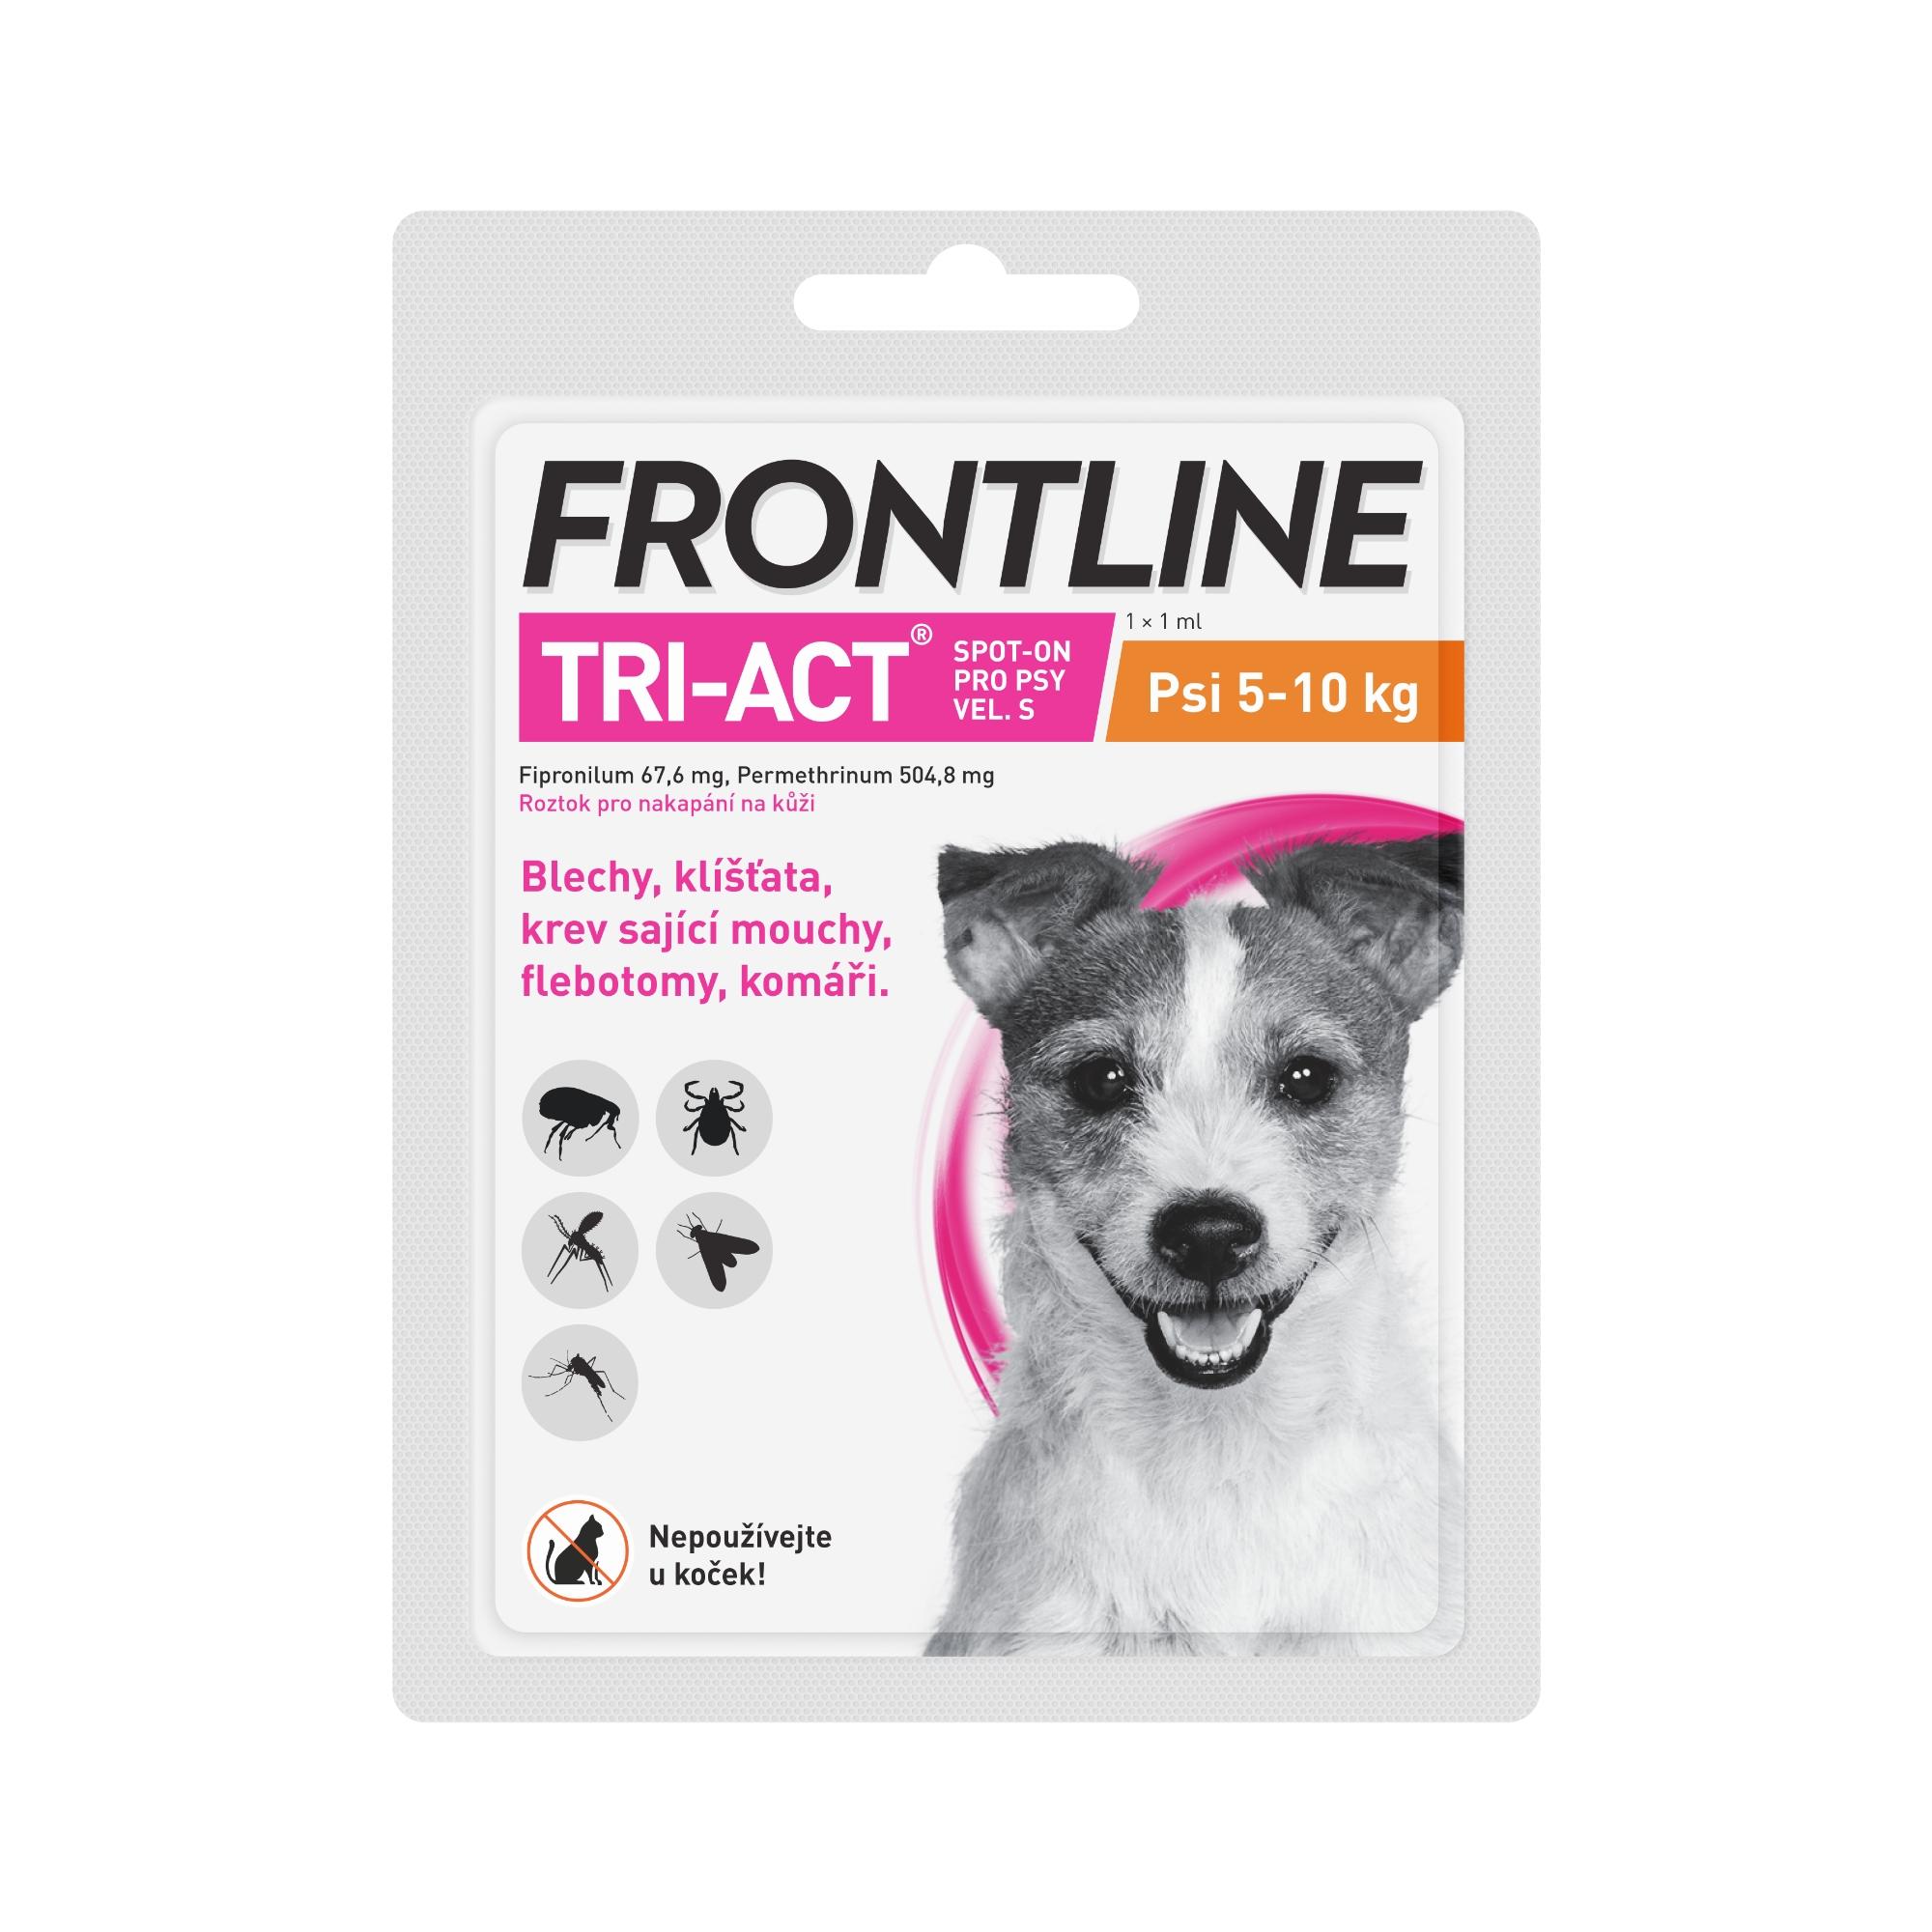 Frontline antiparazitikum TRI-ACT Spot-on Dog 1ml S